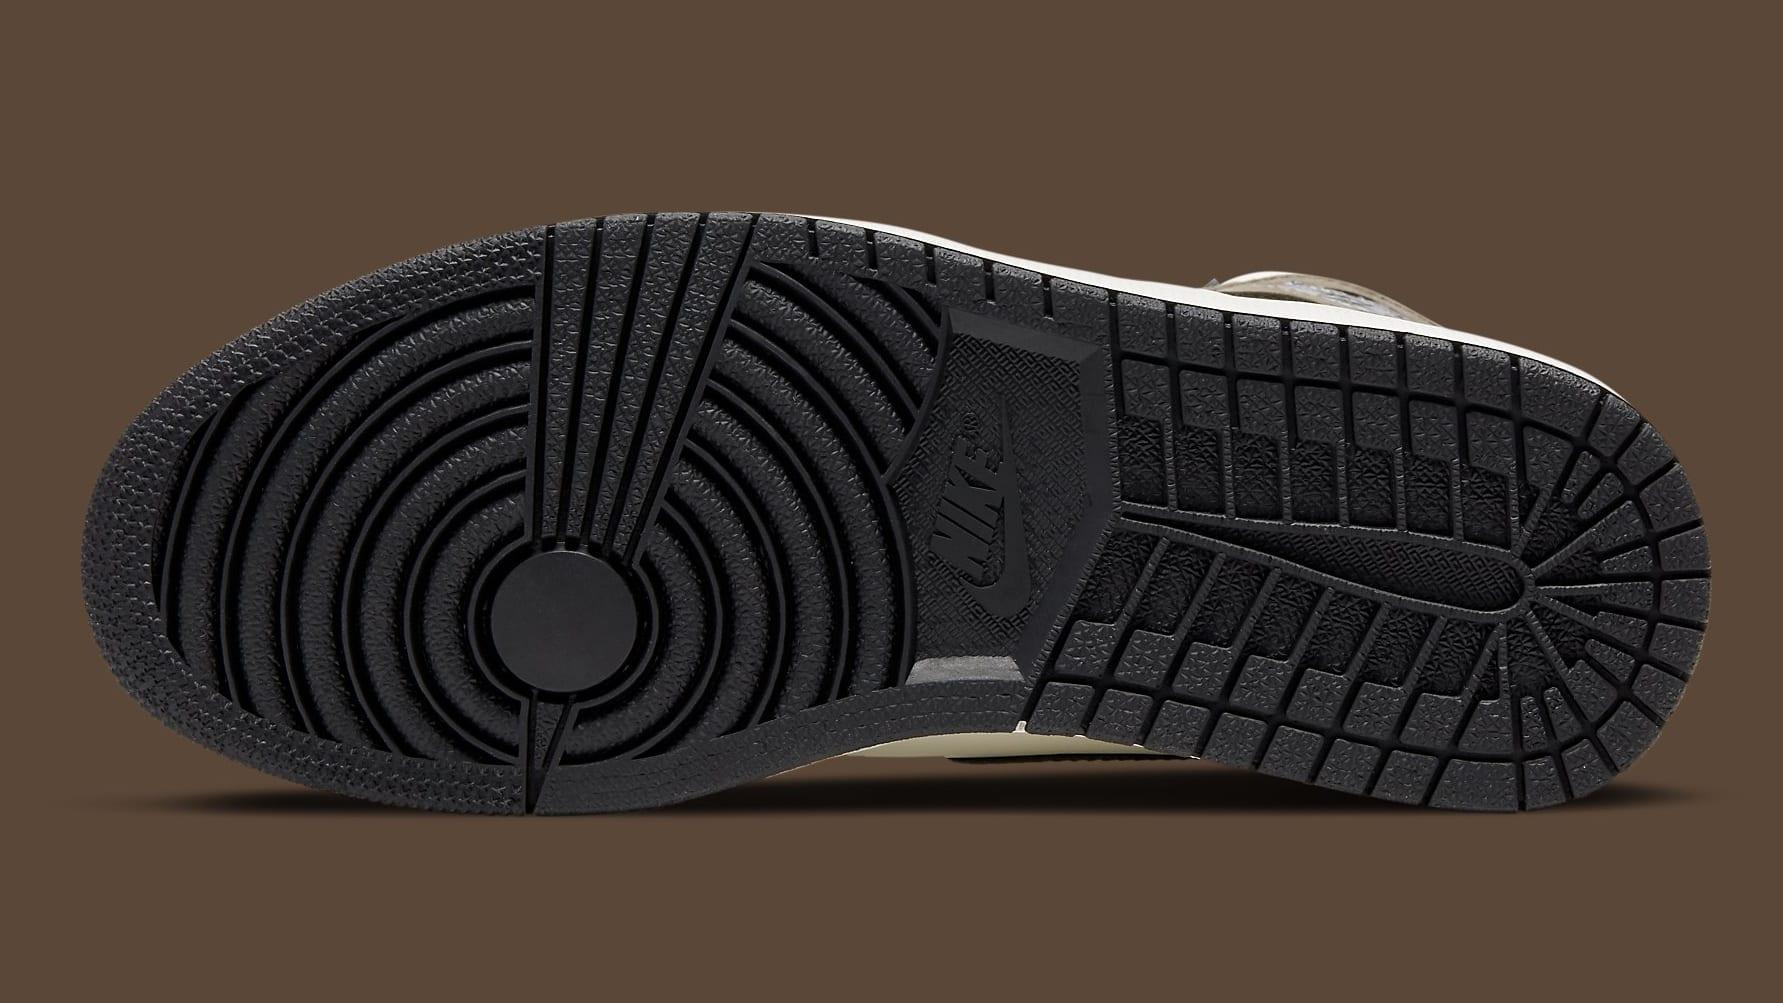 Air Jordan 1 Dark Mocha Release Date 555088-105 Sole